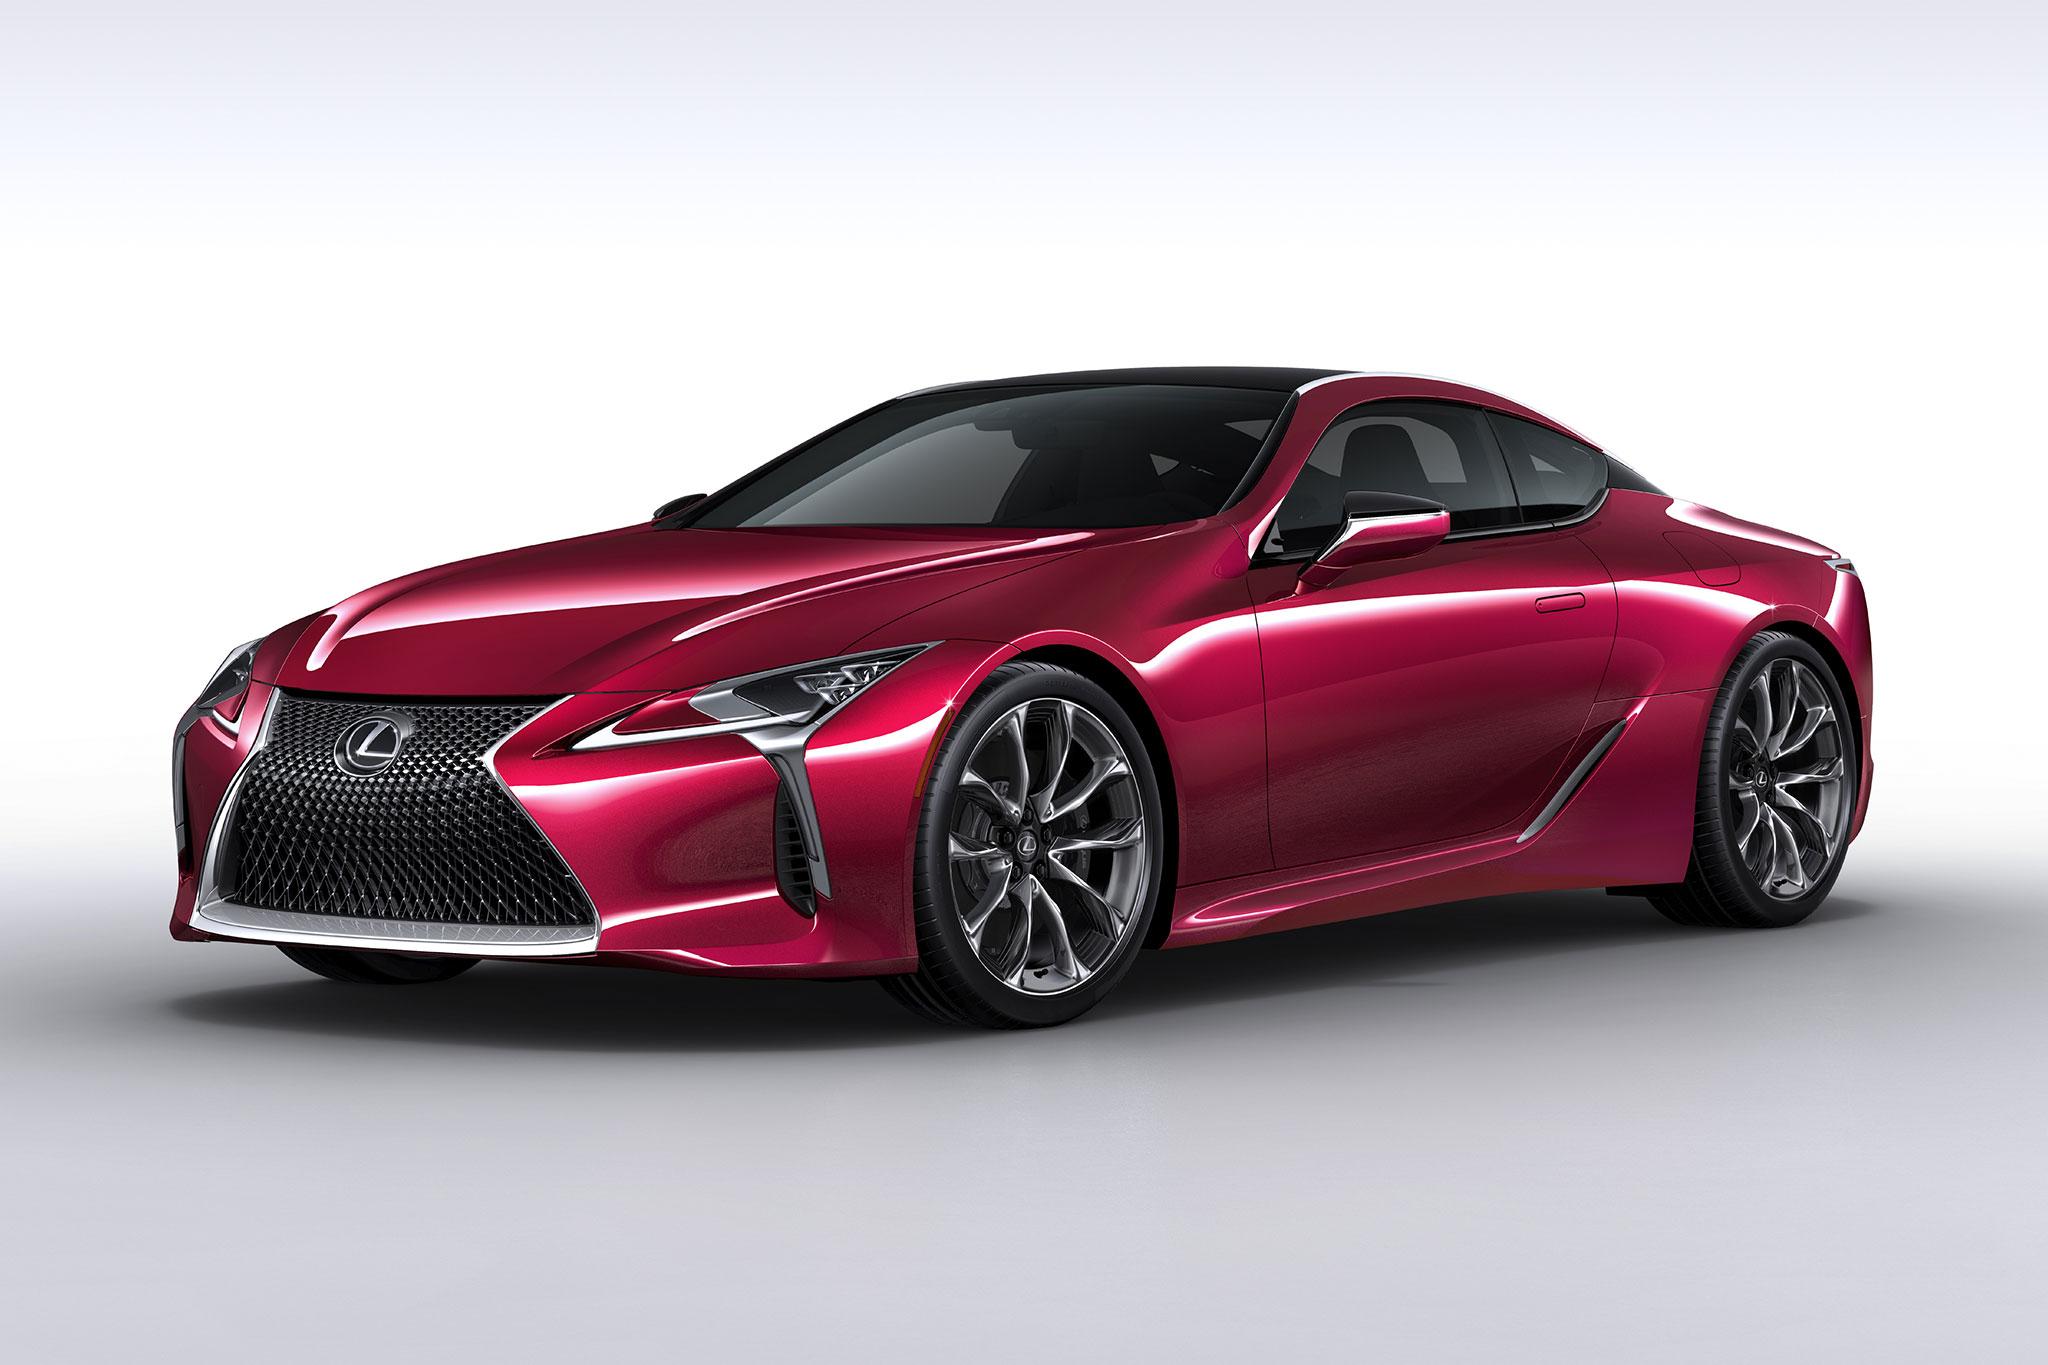 http://st.automobilemag.com/uploads/sites/11/2016/01/2018-Lexus-LC-500-front-three-quarter-01.jpg